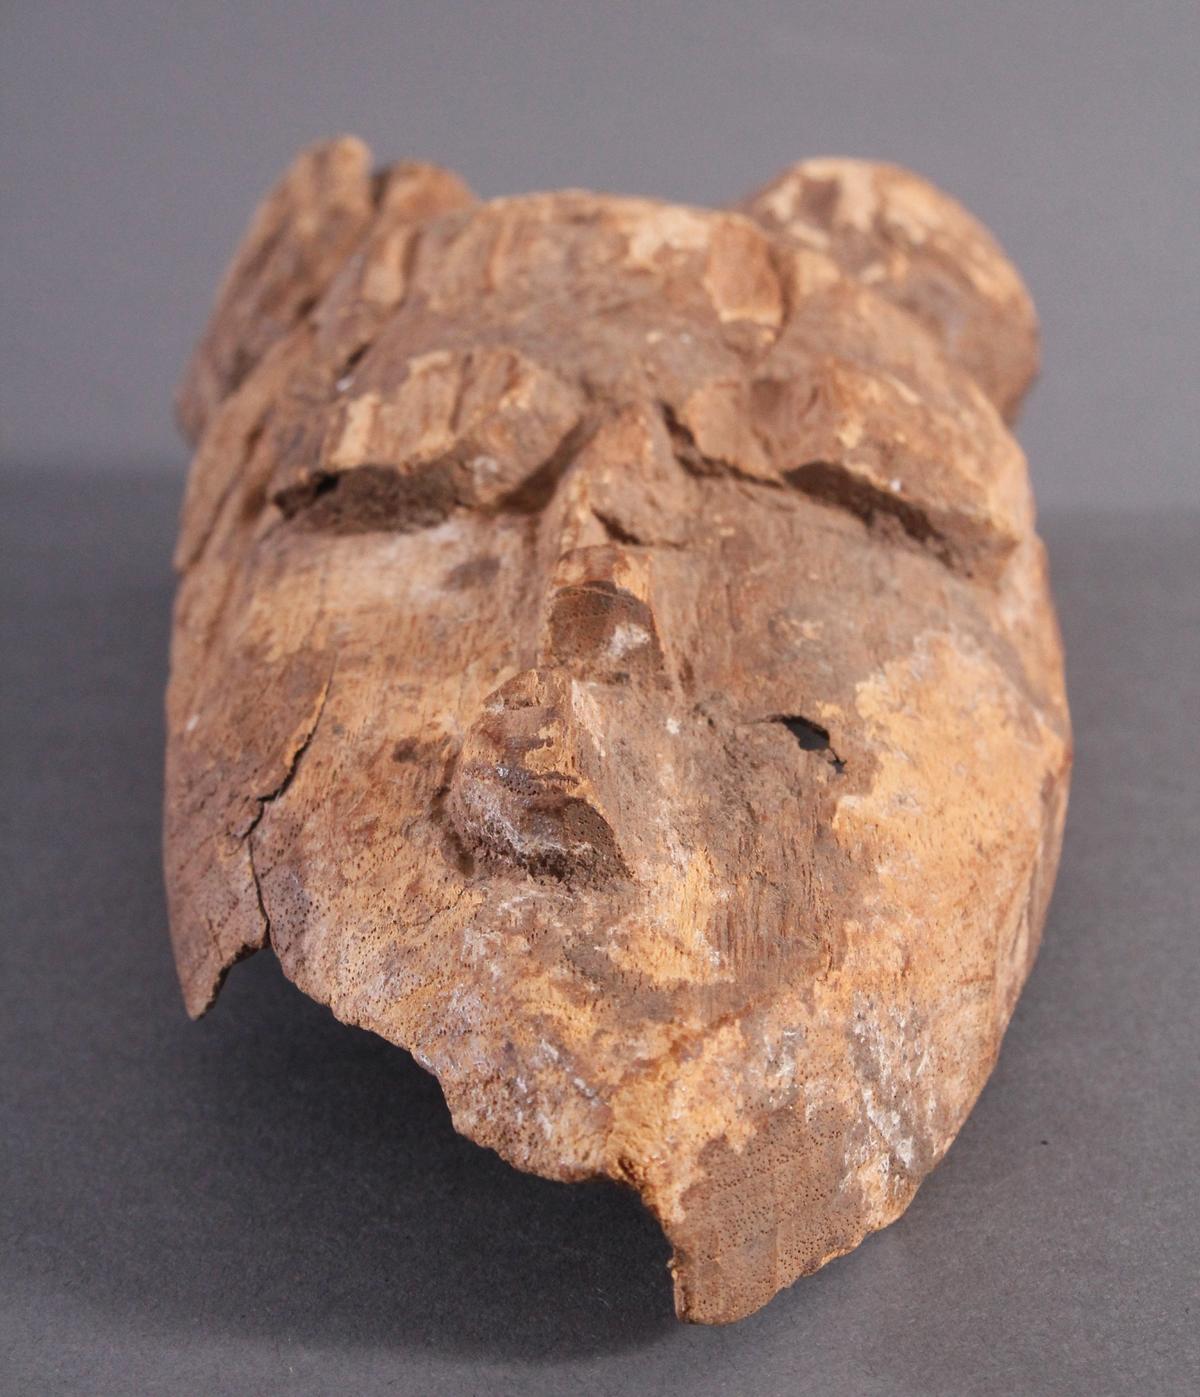 Antike Maske, Baule, Elfenbeinküste 1. Hälfte 20. Jh.-5